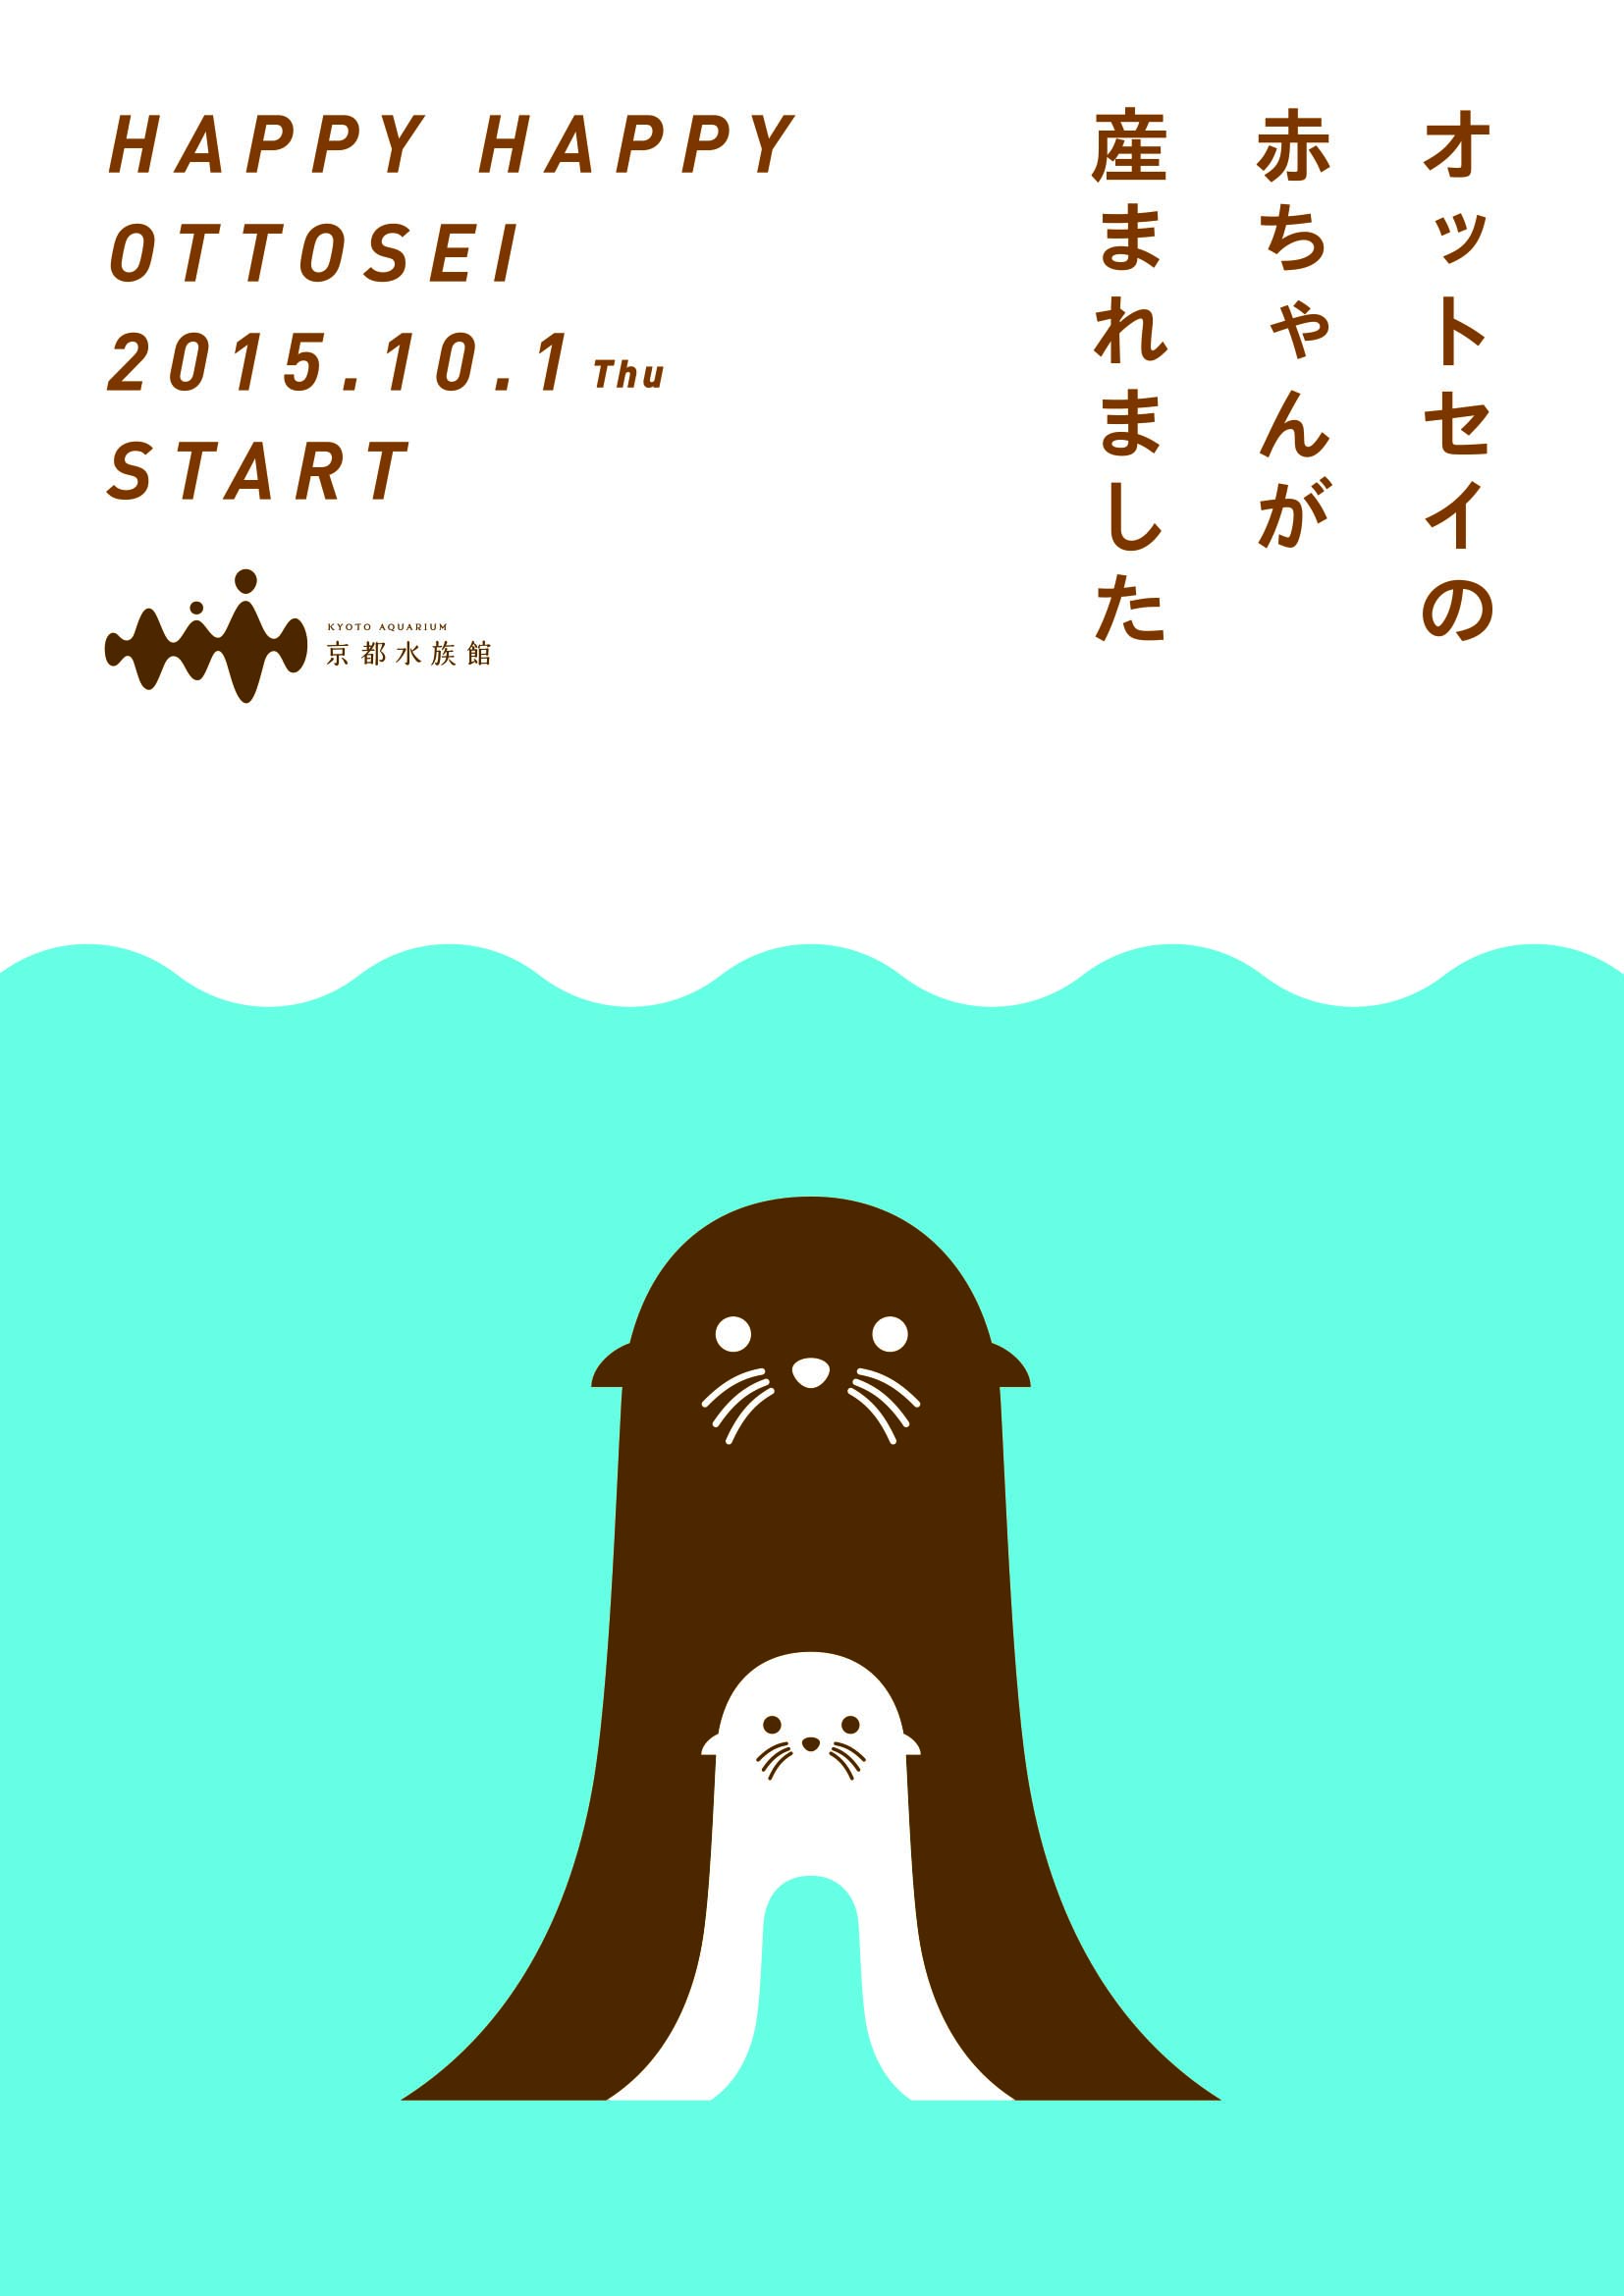 hok_16_ottosei_00